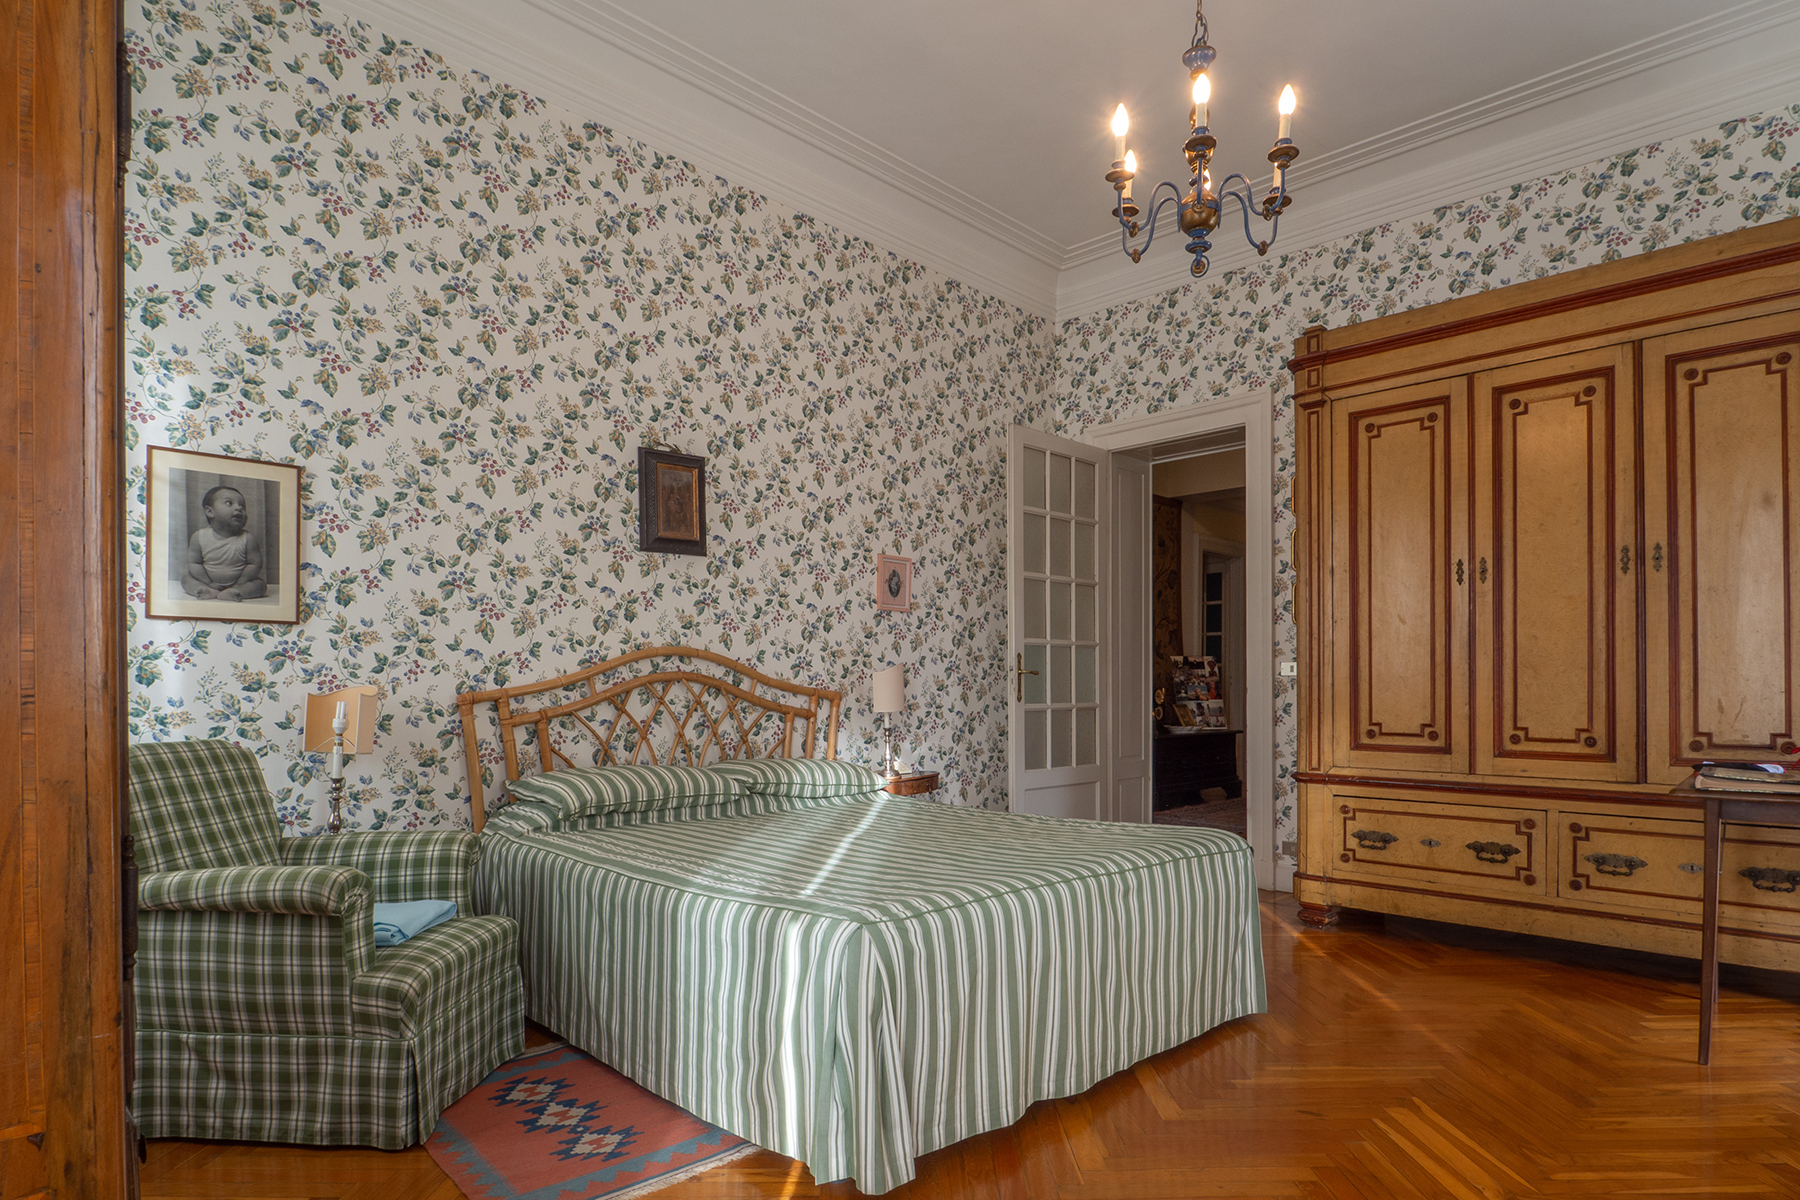 Casa indipendente in Vendita a Torino: 5 locali, 657 mq - Foto 14